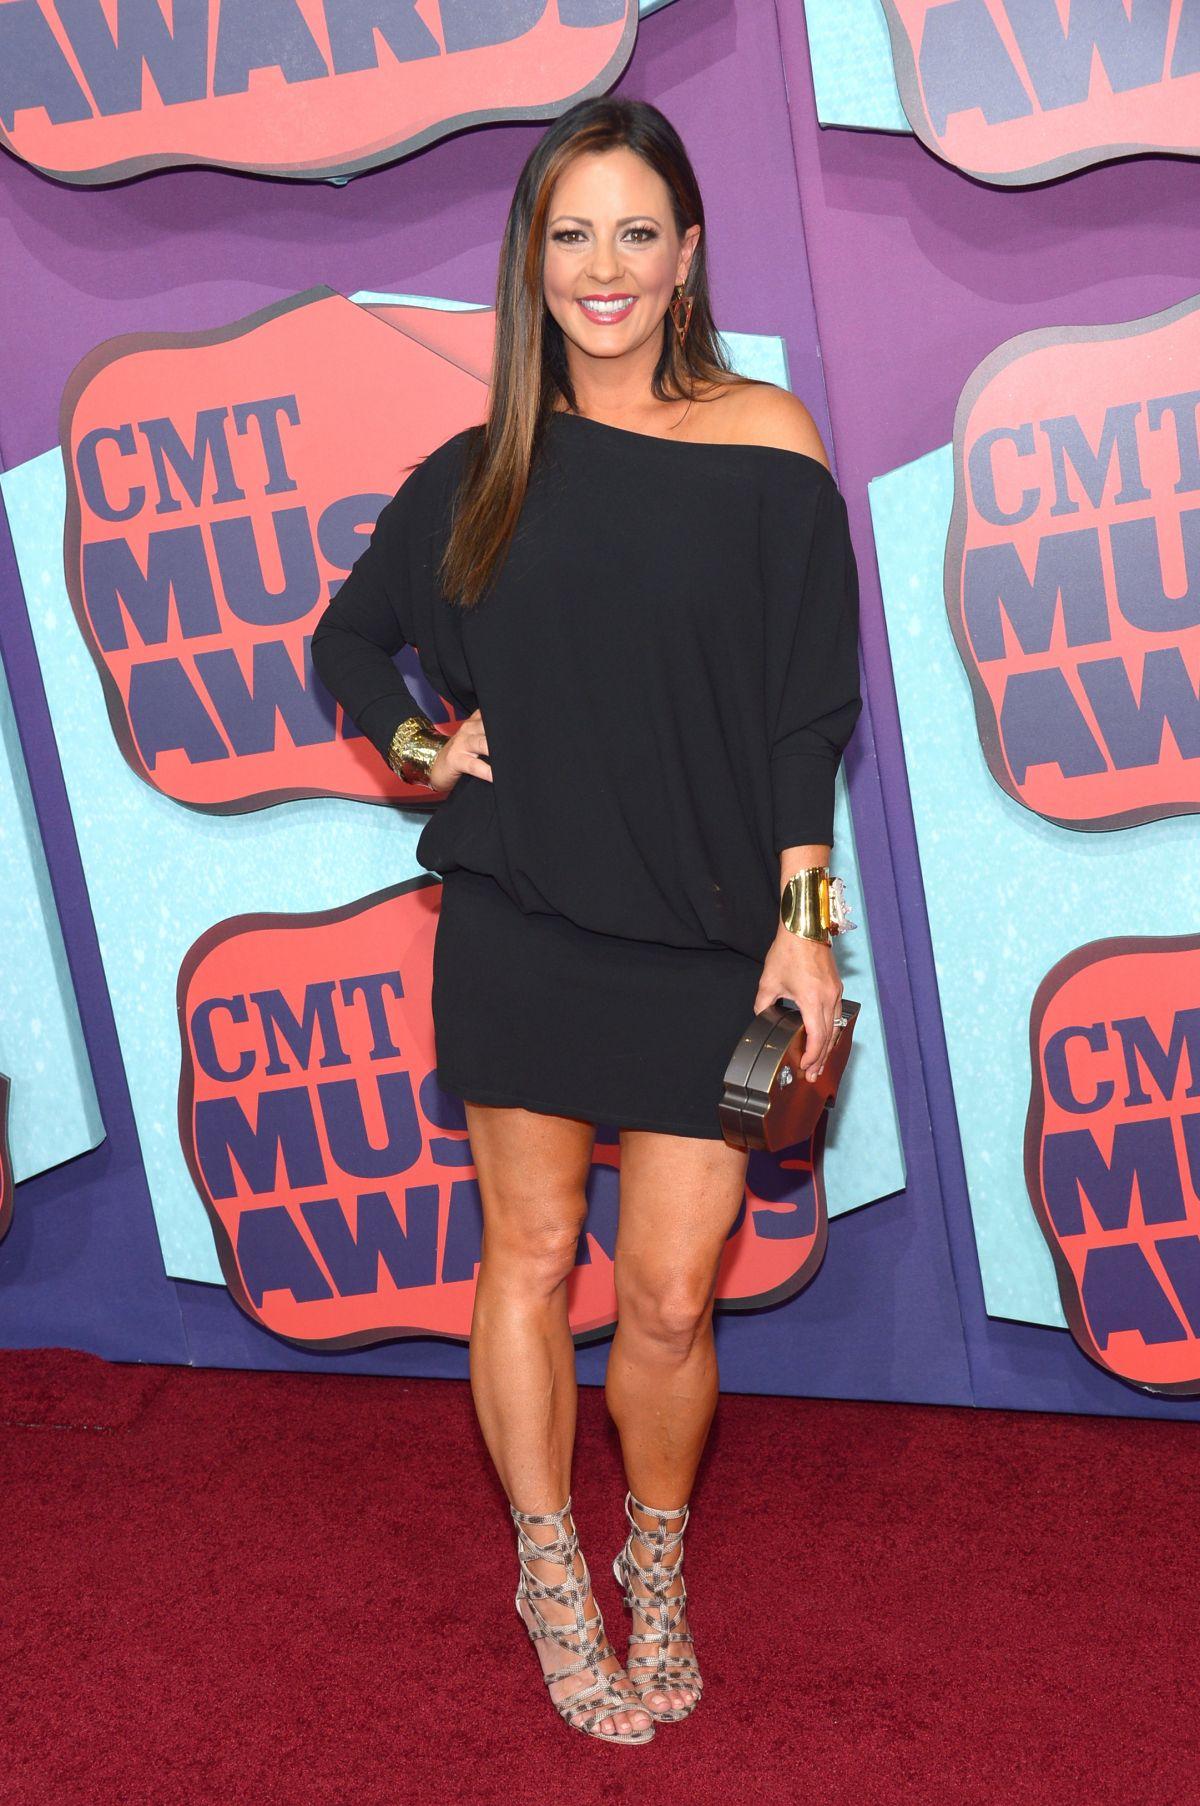 SARA EVANS at 2014 CMT Music Awards in Nashville